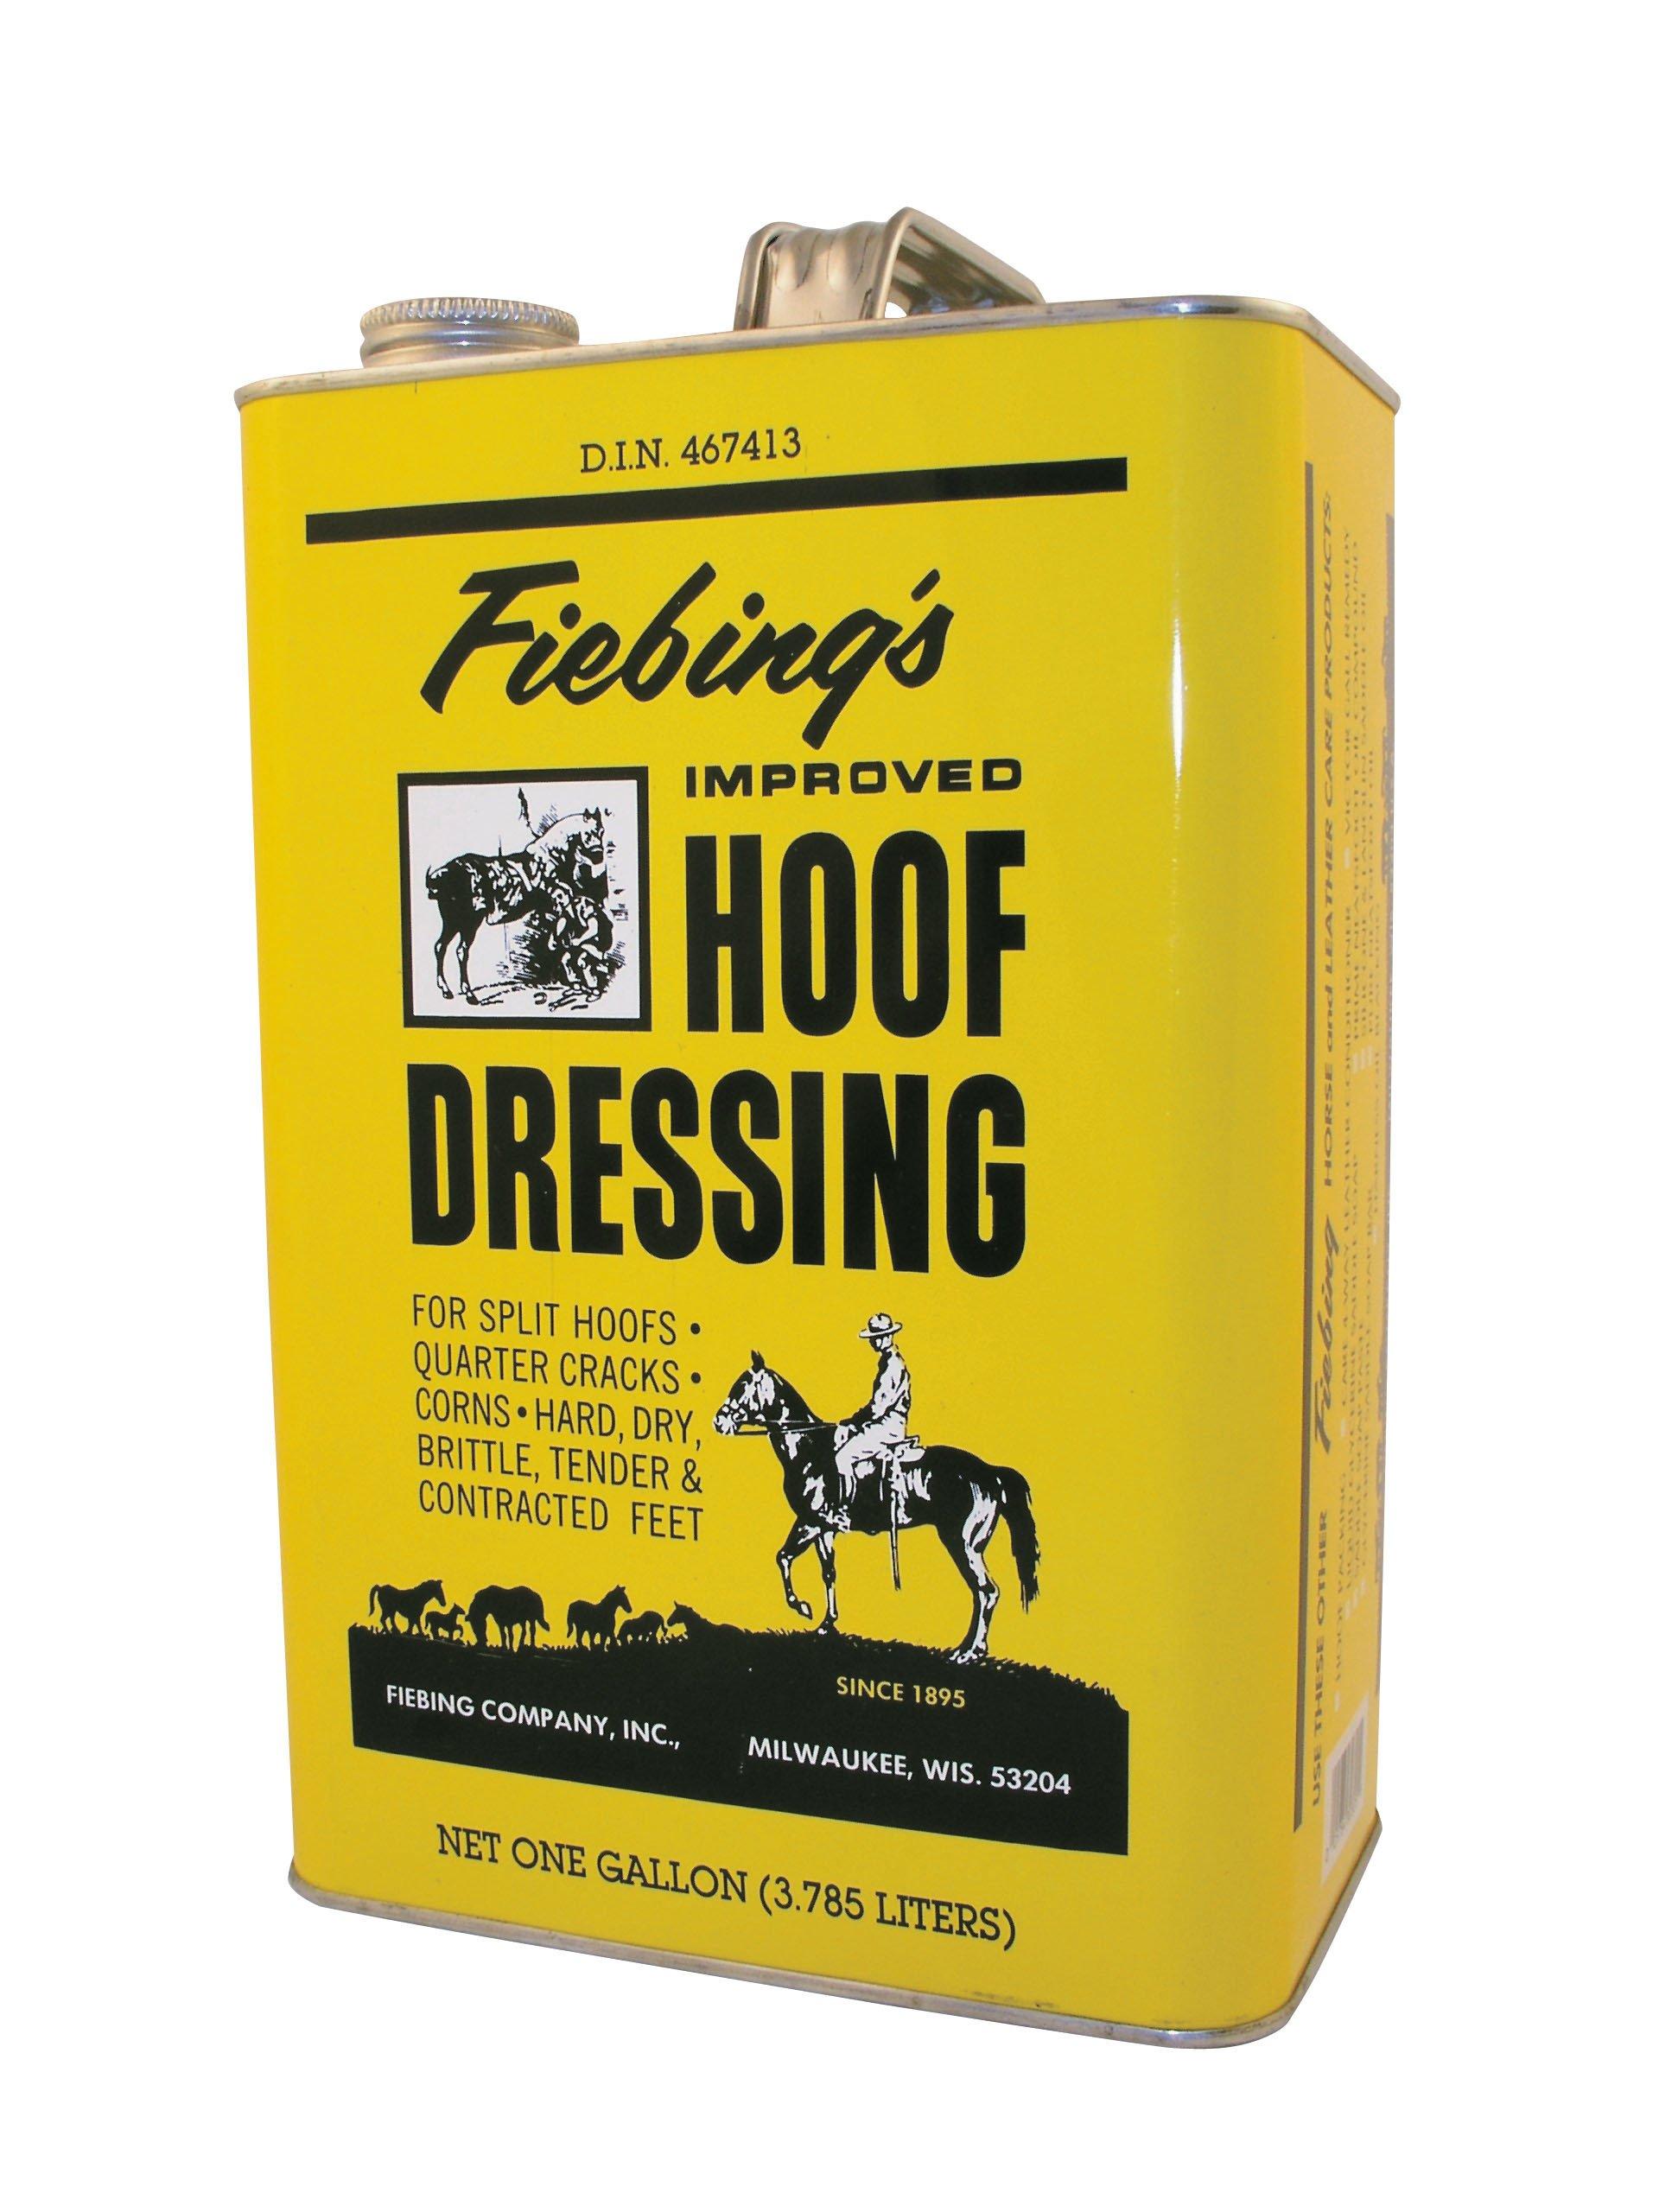 Fiebing's Hoof Dressing by Fiebing's